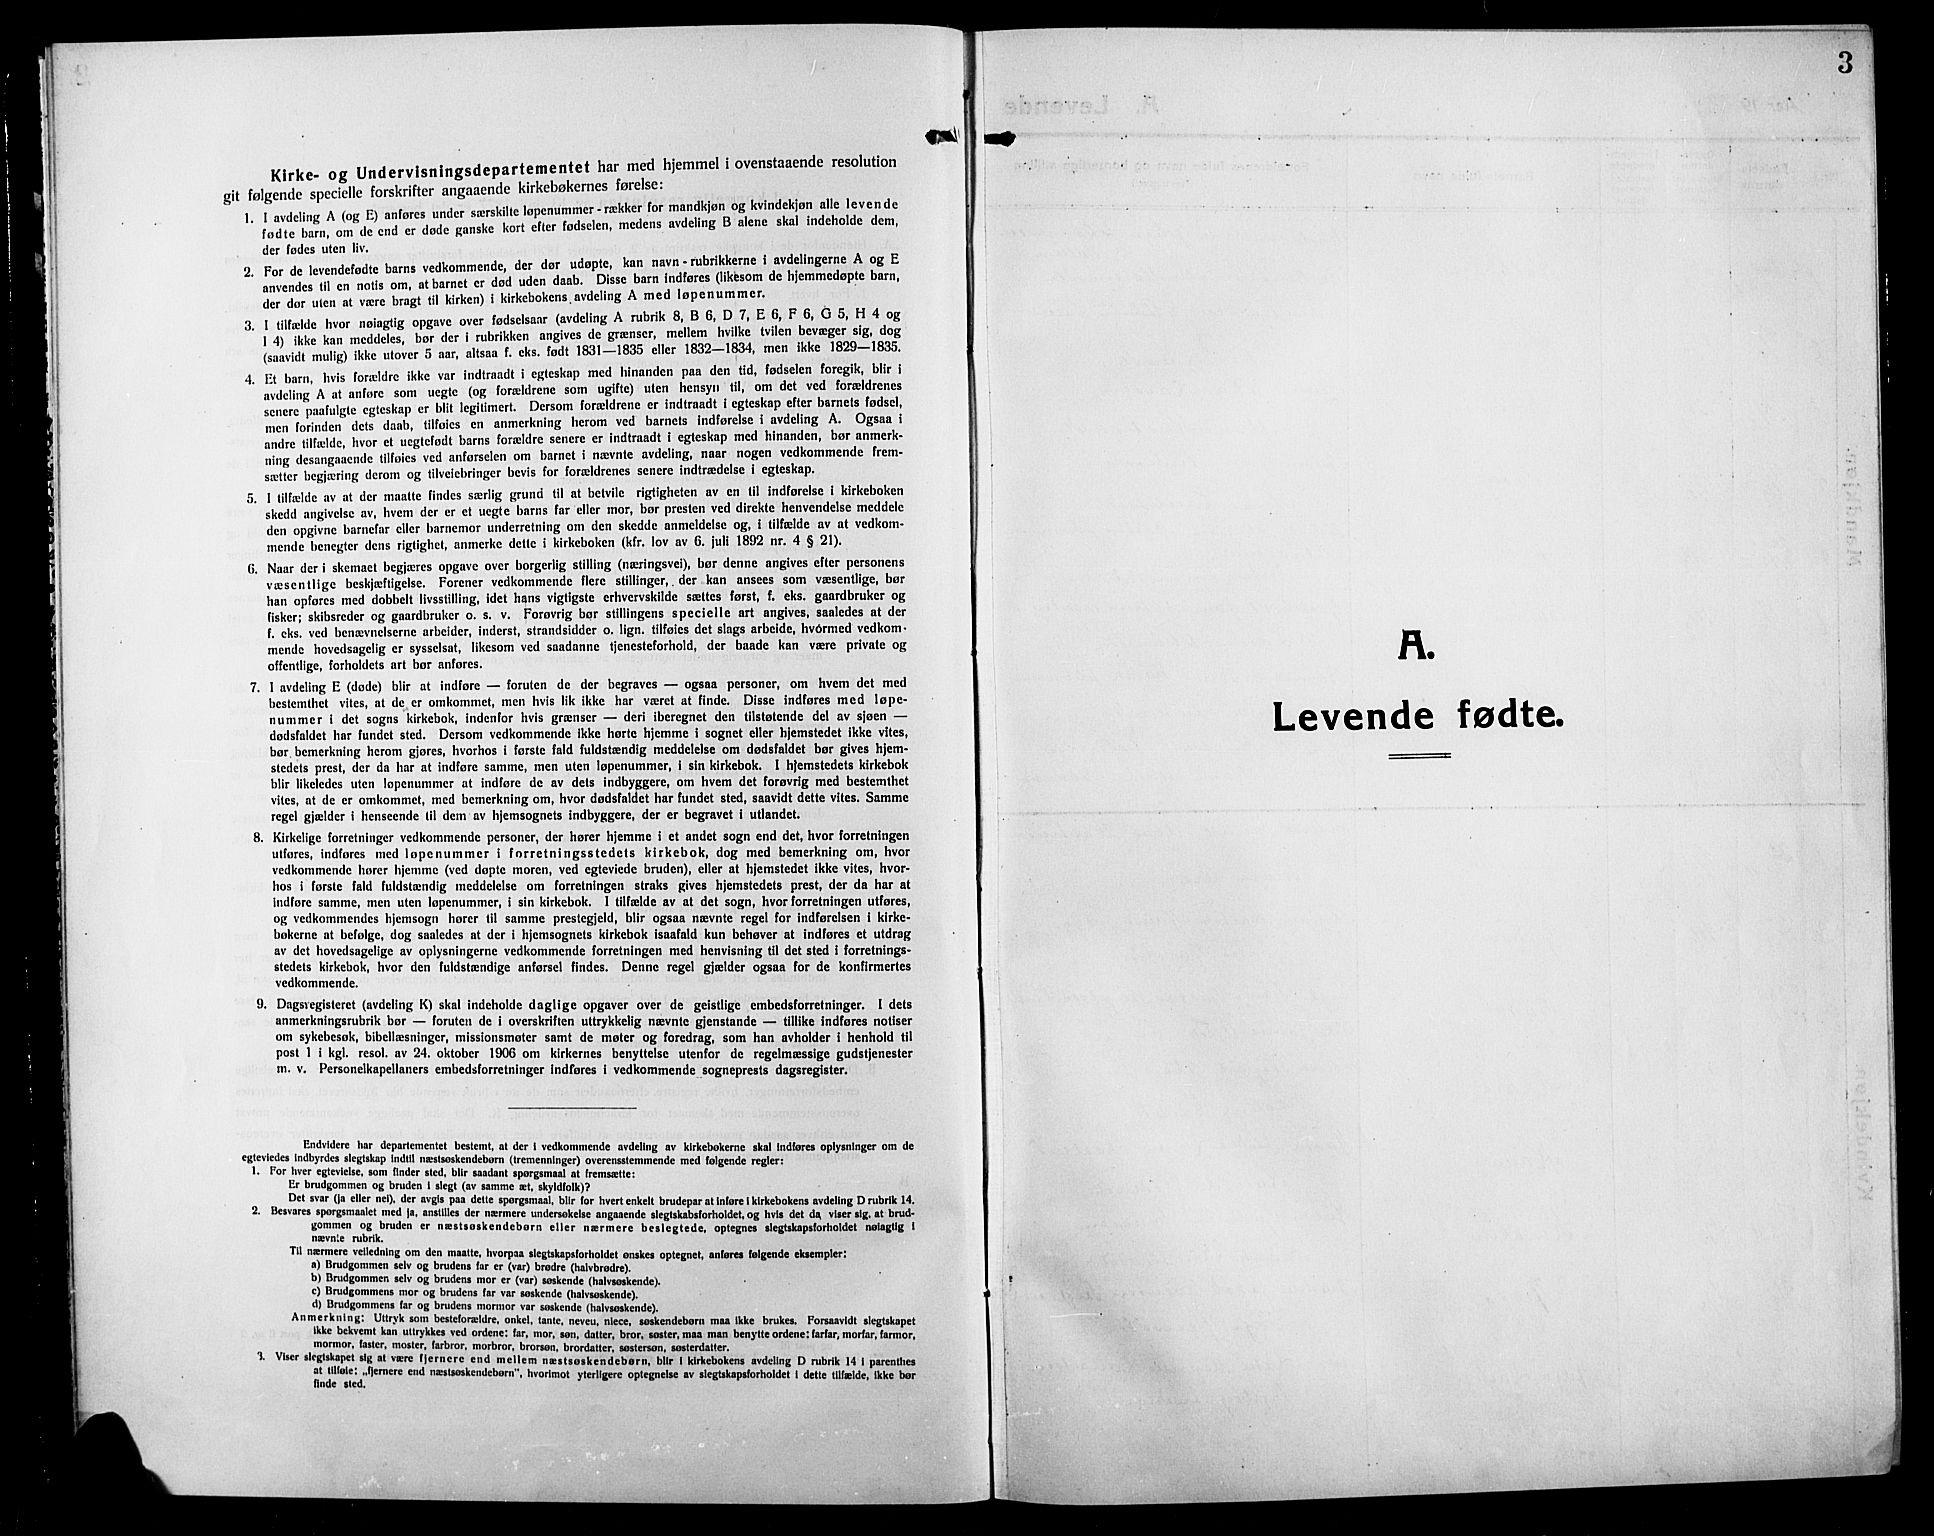 SAH, Søndre Land prestekontor, L/L0006: Klokkerbok nr. 6, 1912-1925, s. 3